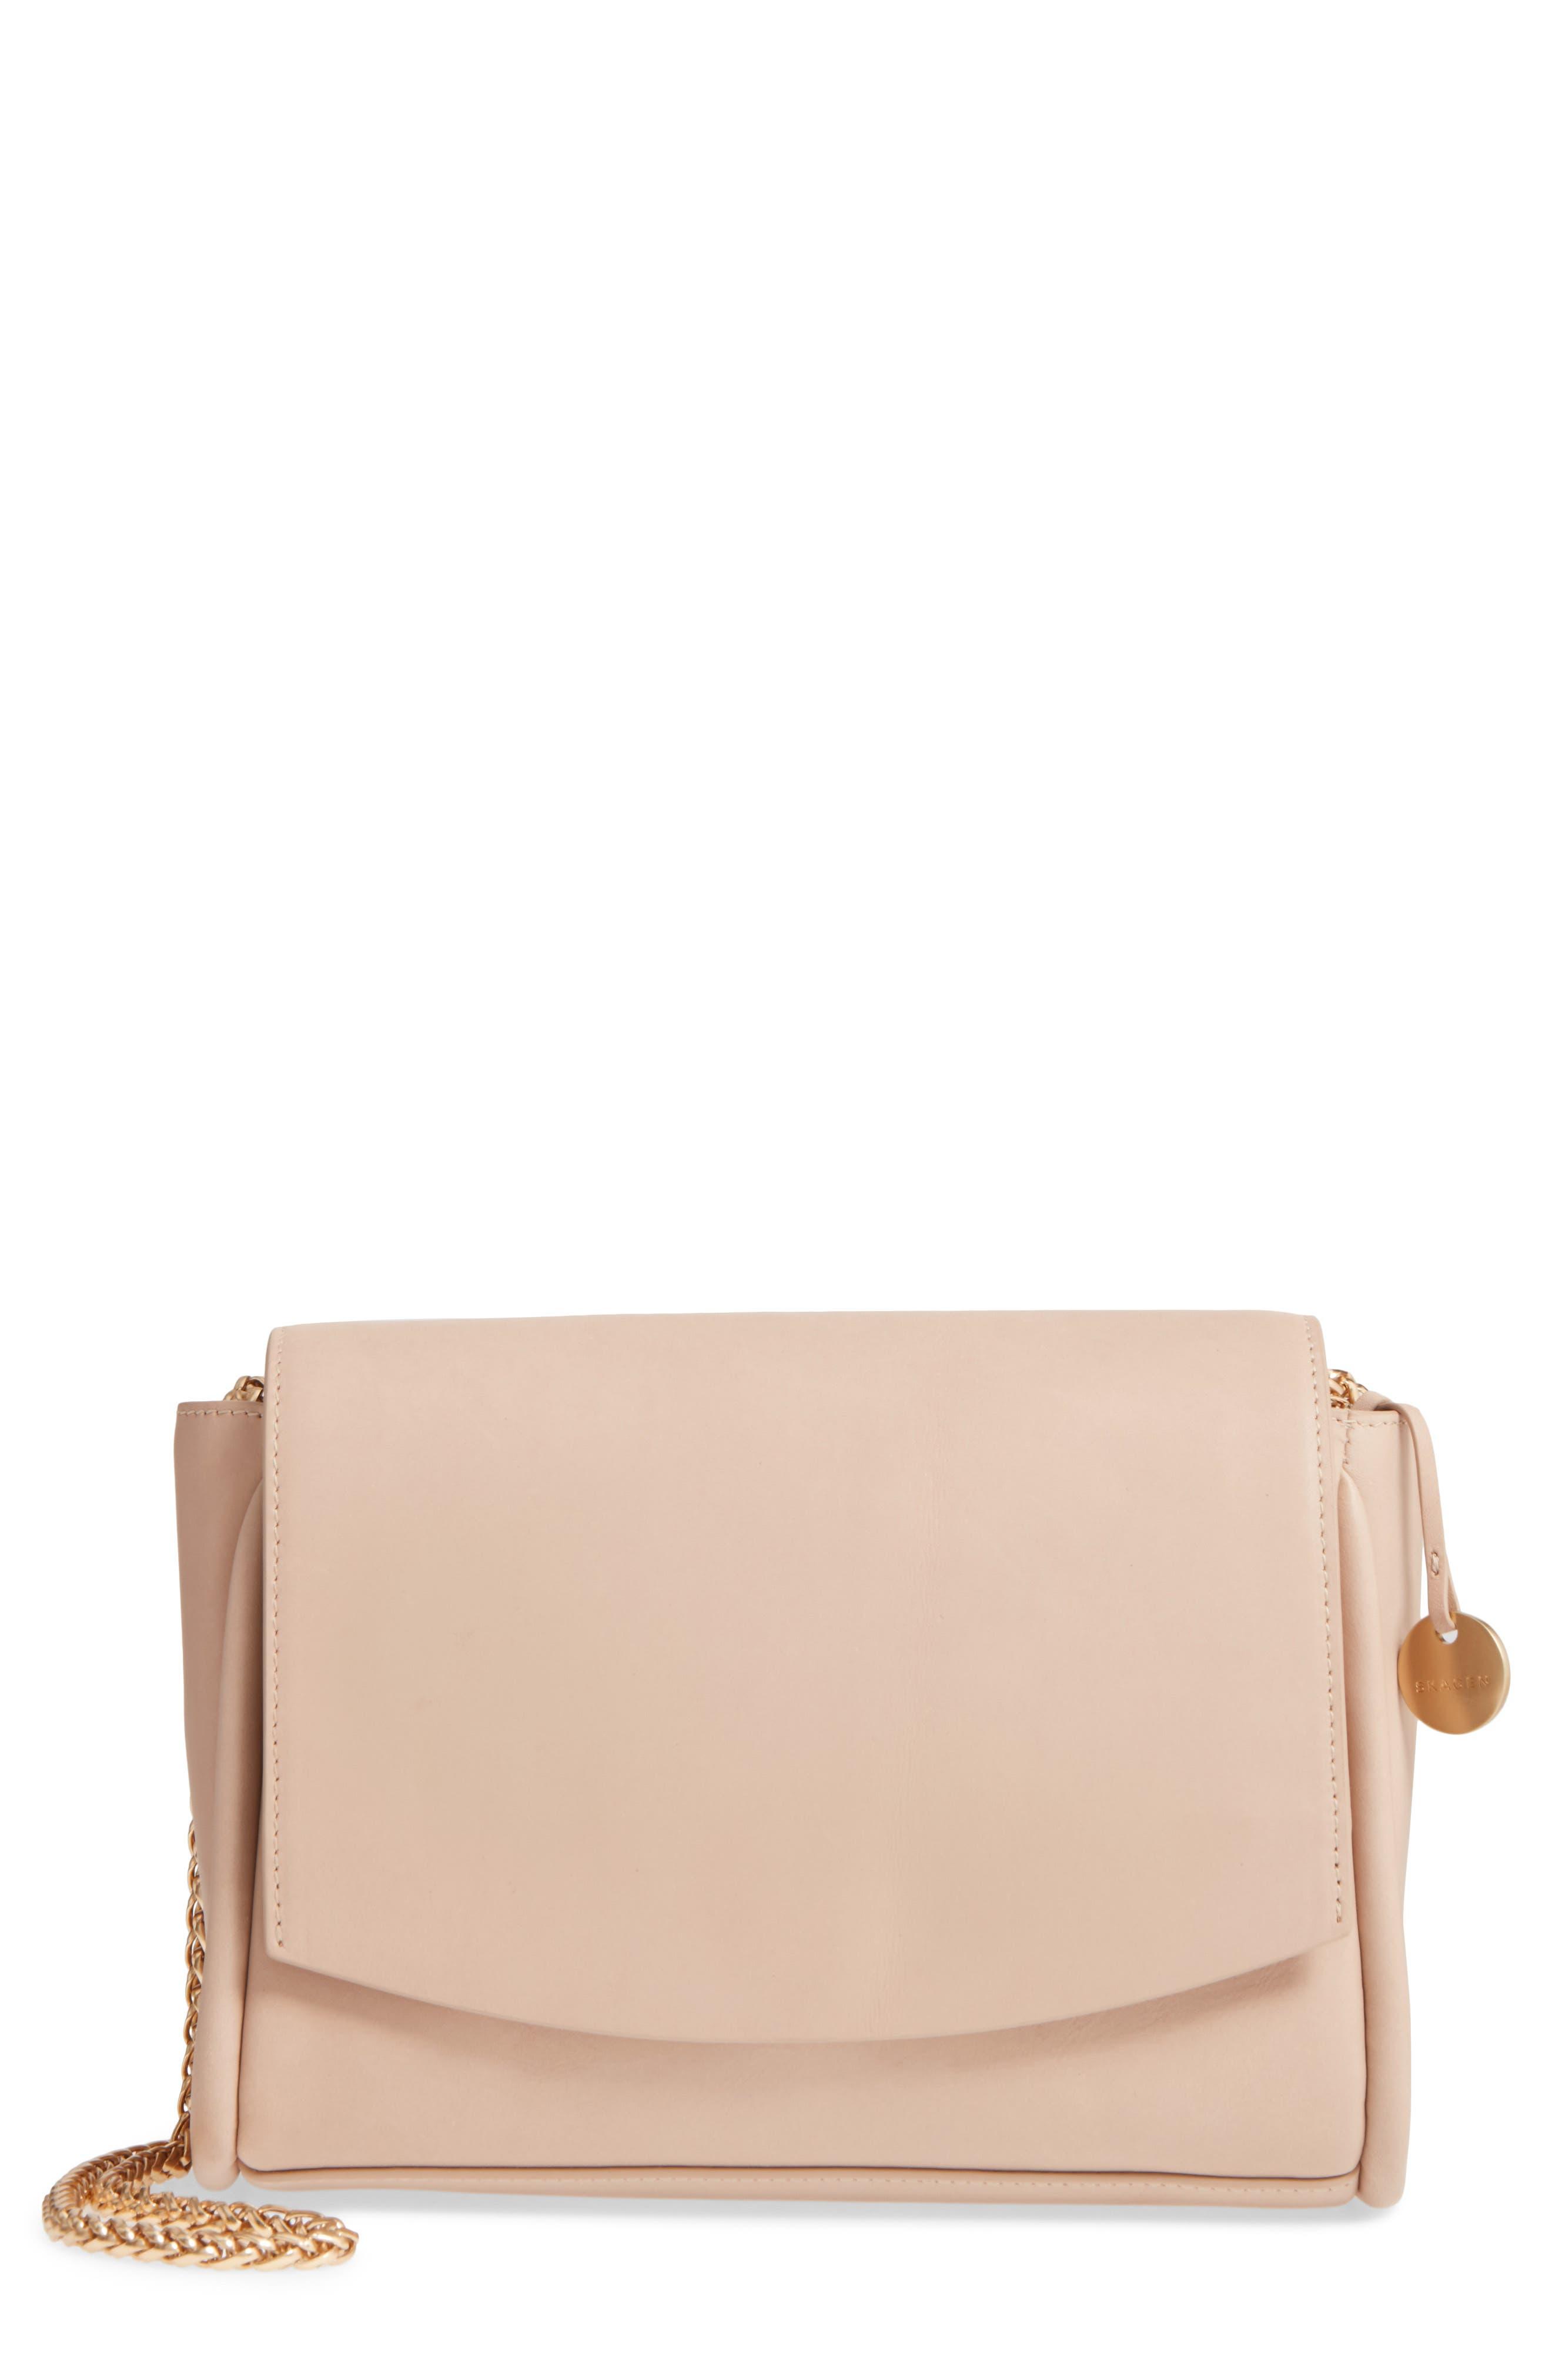 Sylvi Calfskin Leather Crossbody Bag,                             Main thumbnail 1, color,                             251